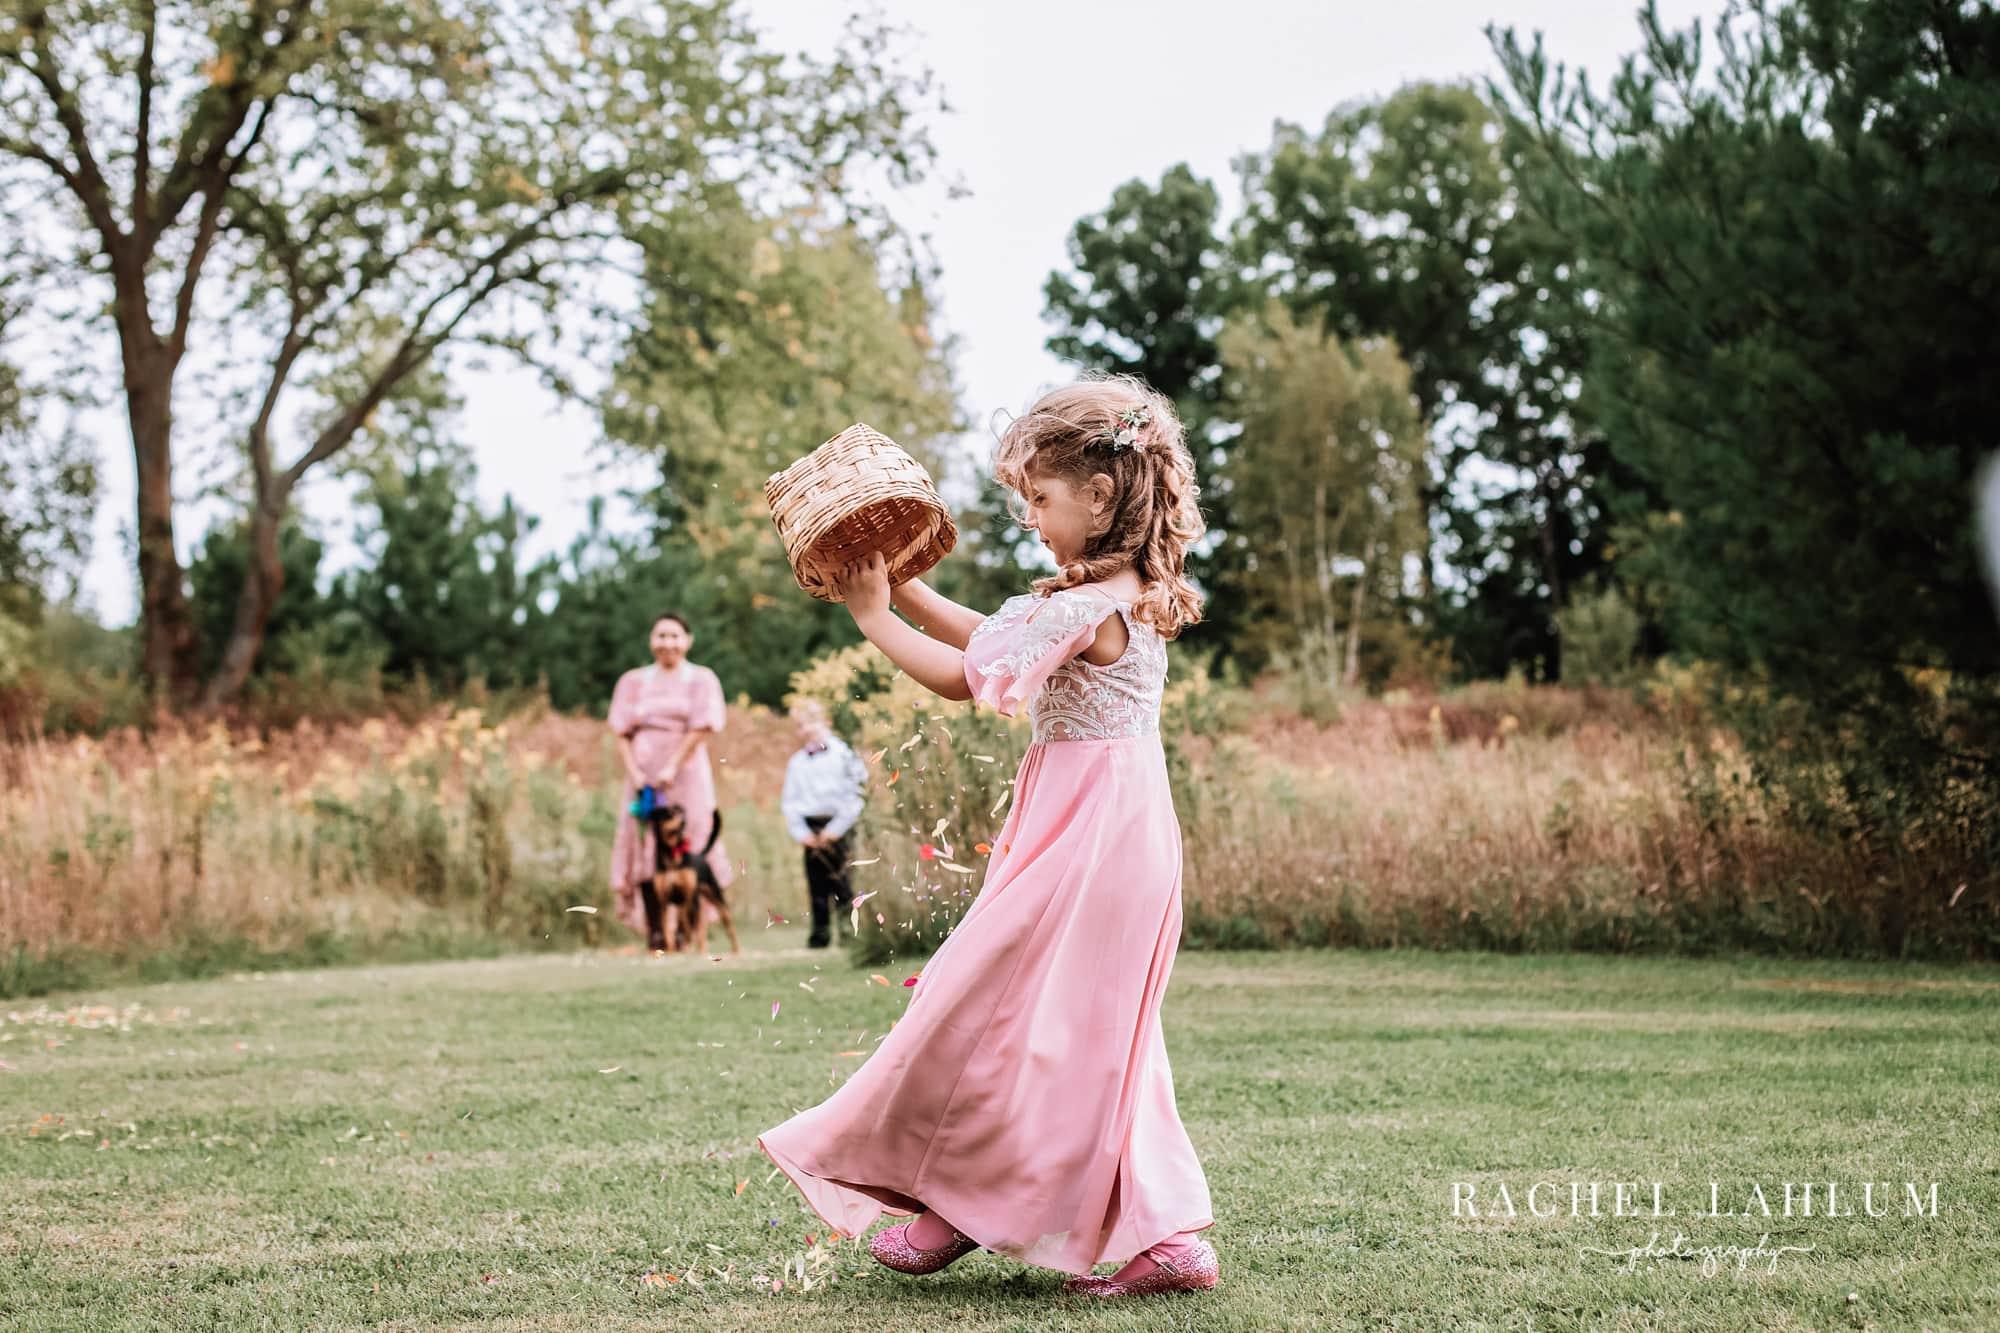 Flower girl empties her basket as she walks down the aisle.